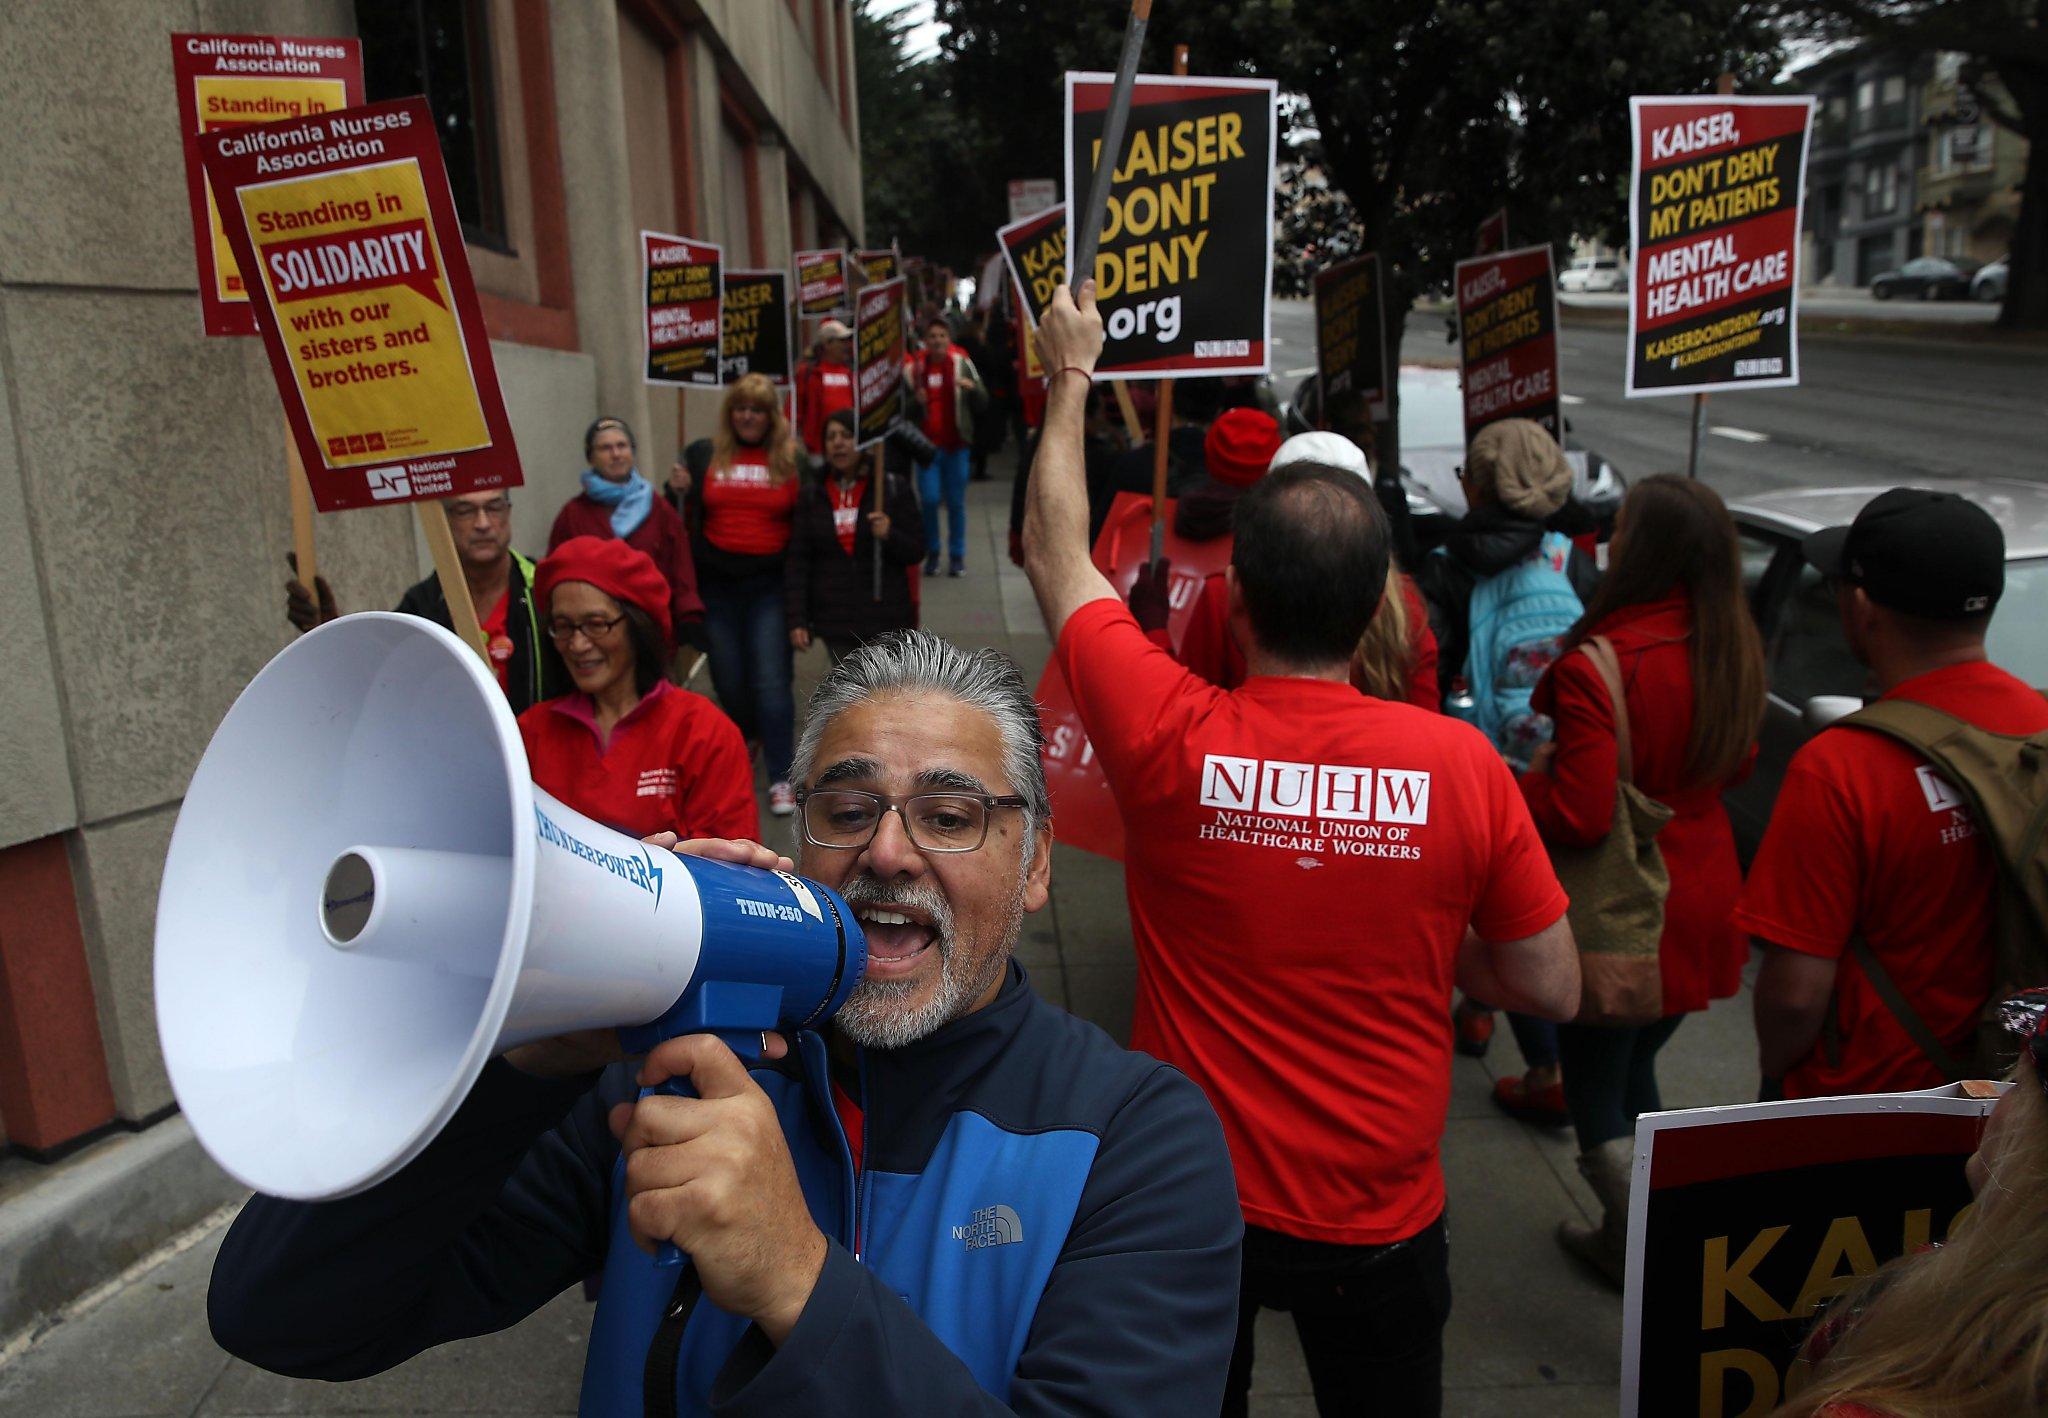 Kaiser mental health workers plan California strike Tuesday